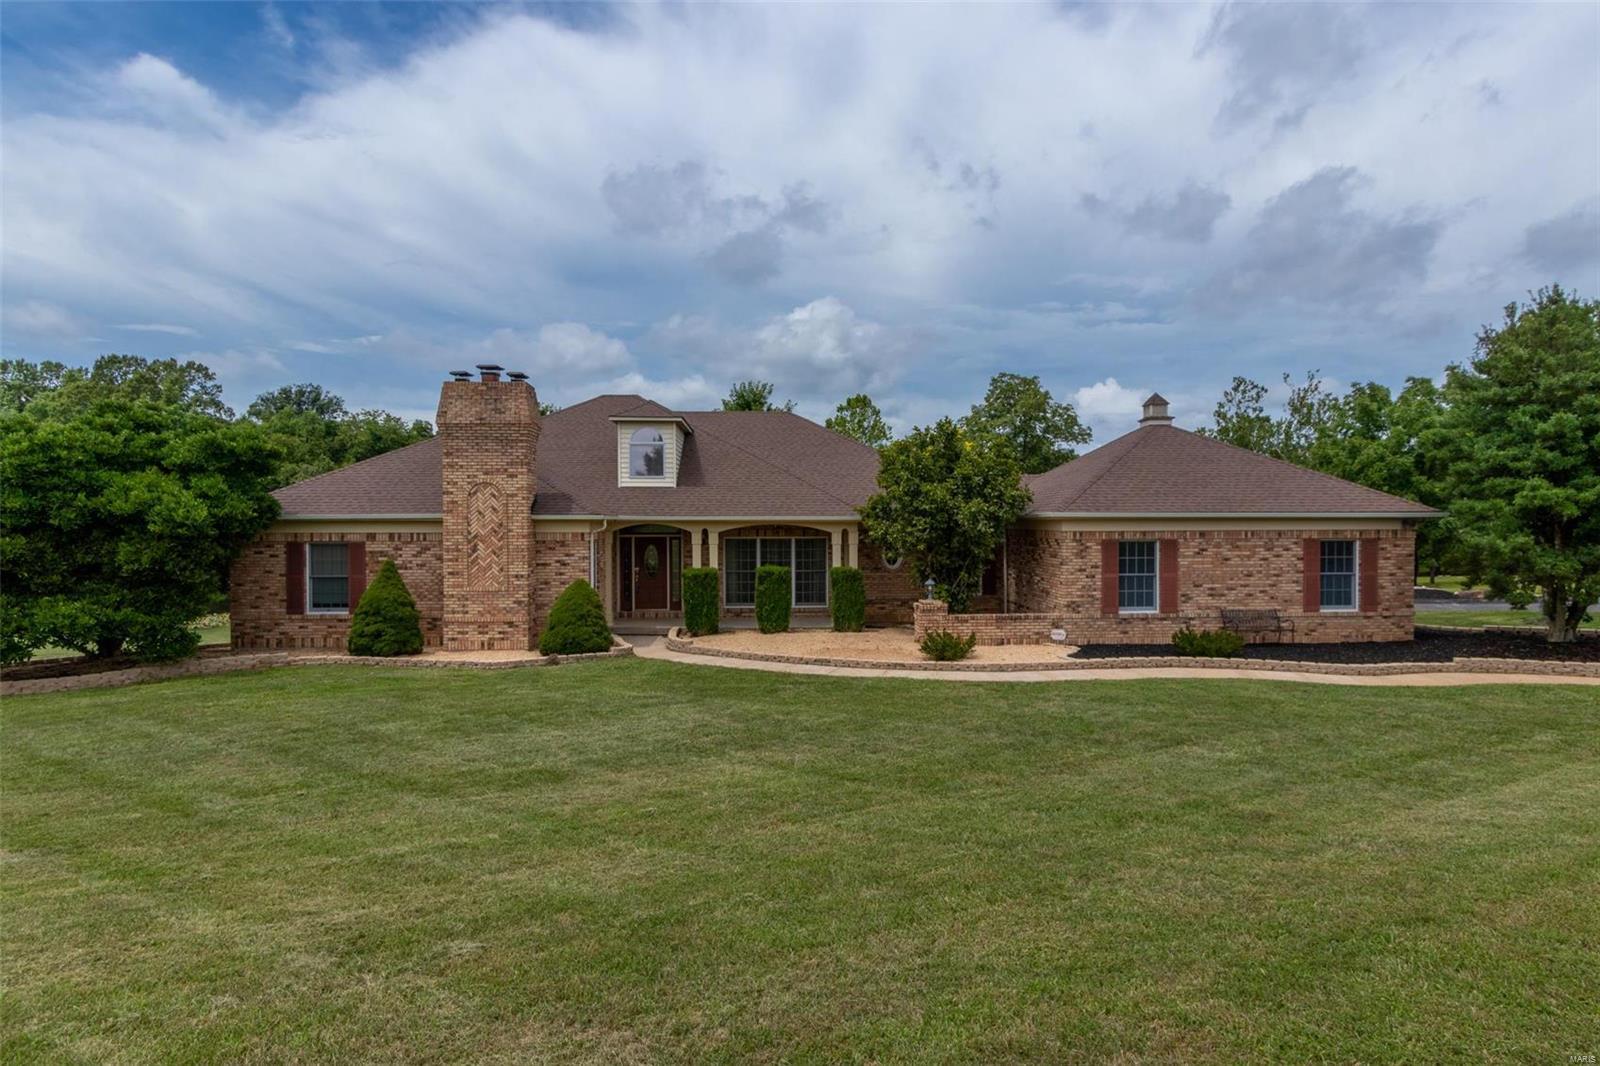 8109 MAPAVI Property Photo - Bonne Terre, MO real estate listing